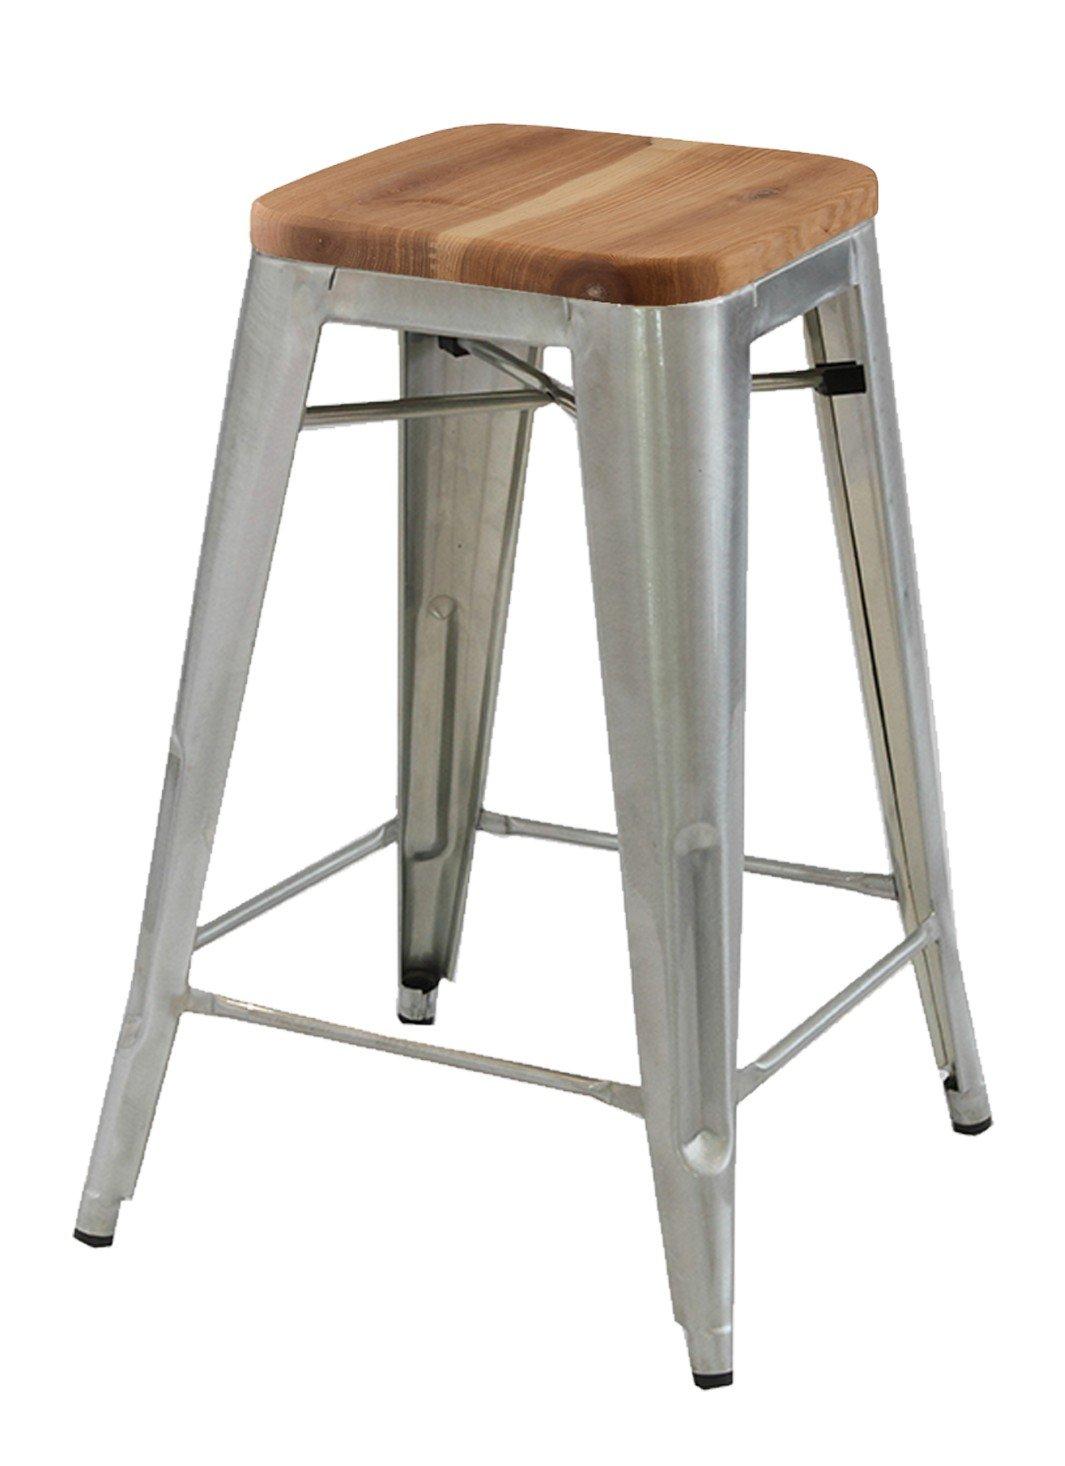 Replica Tolix Kitchen Stool With Timber Seat U3 Shop